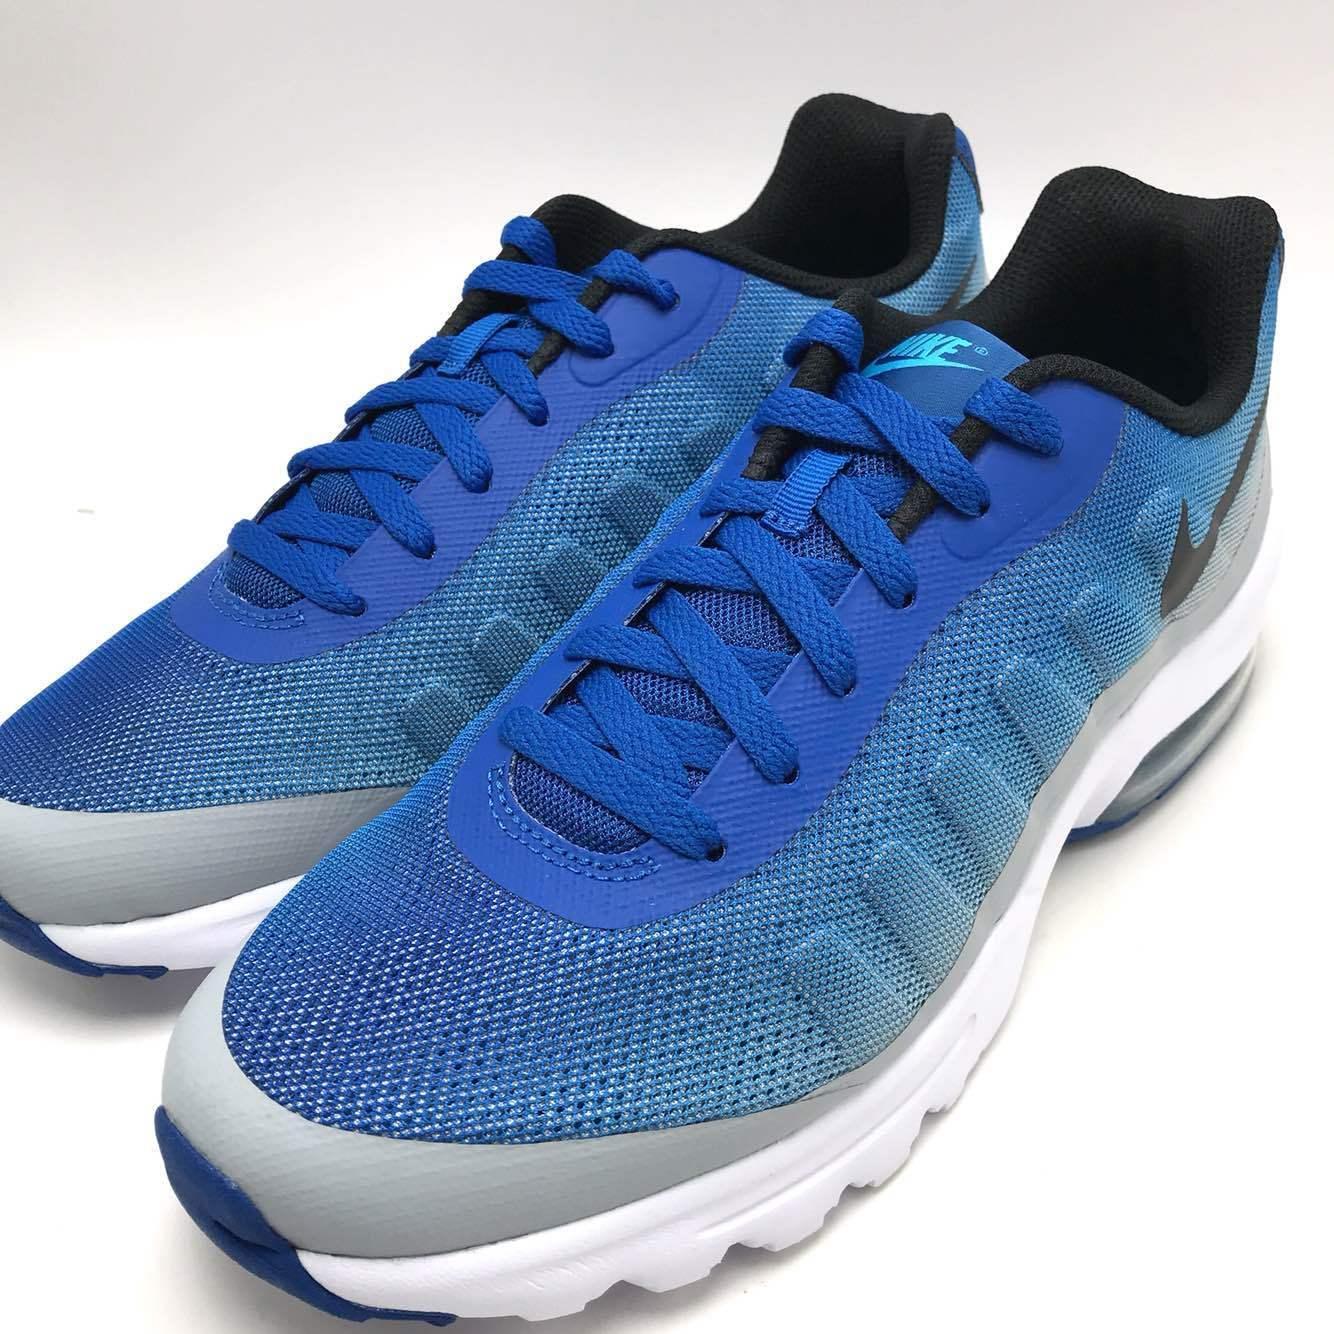 Nike Air Max Invigor Print Men's Running bluee Jay Black-Wolf Grey 749688-403